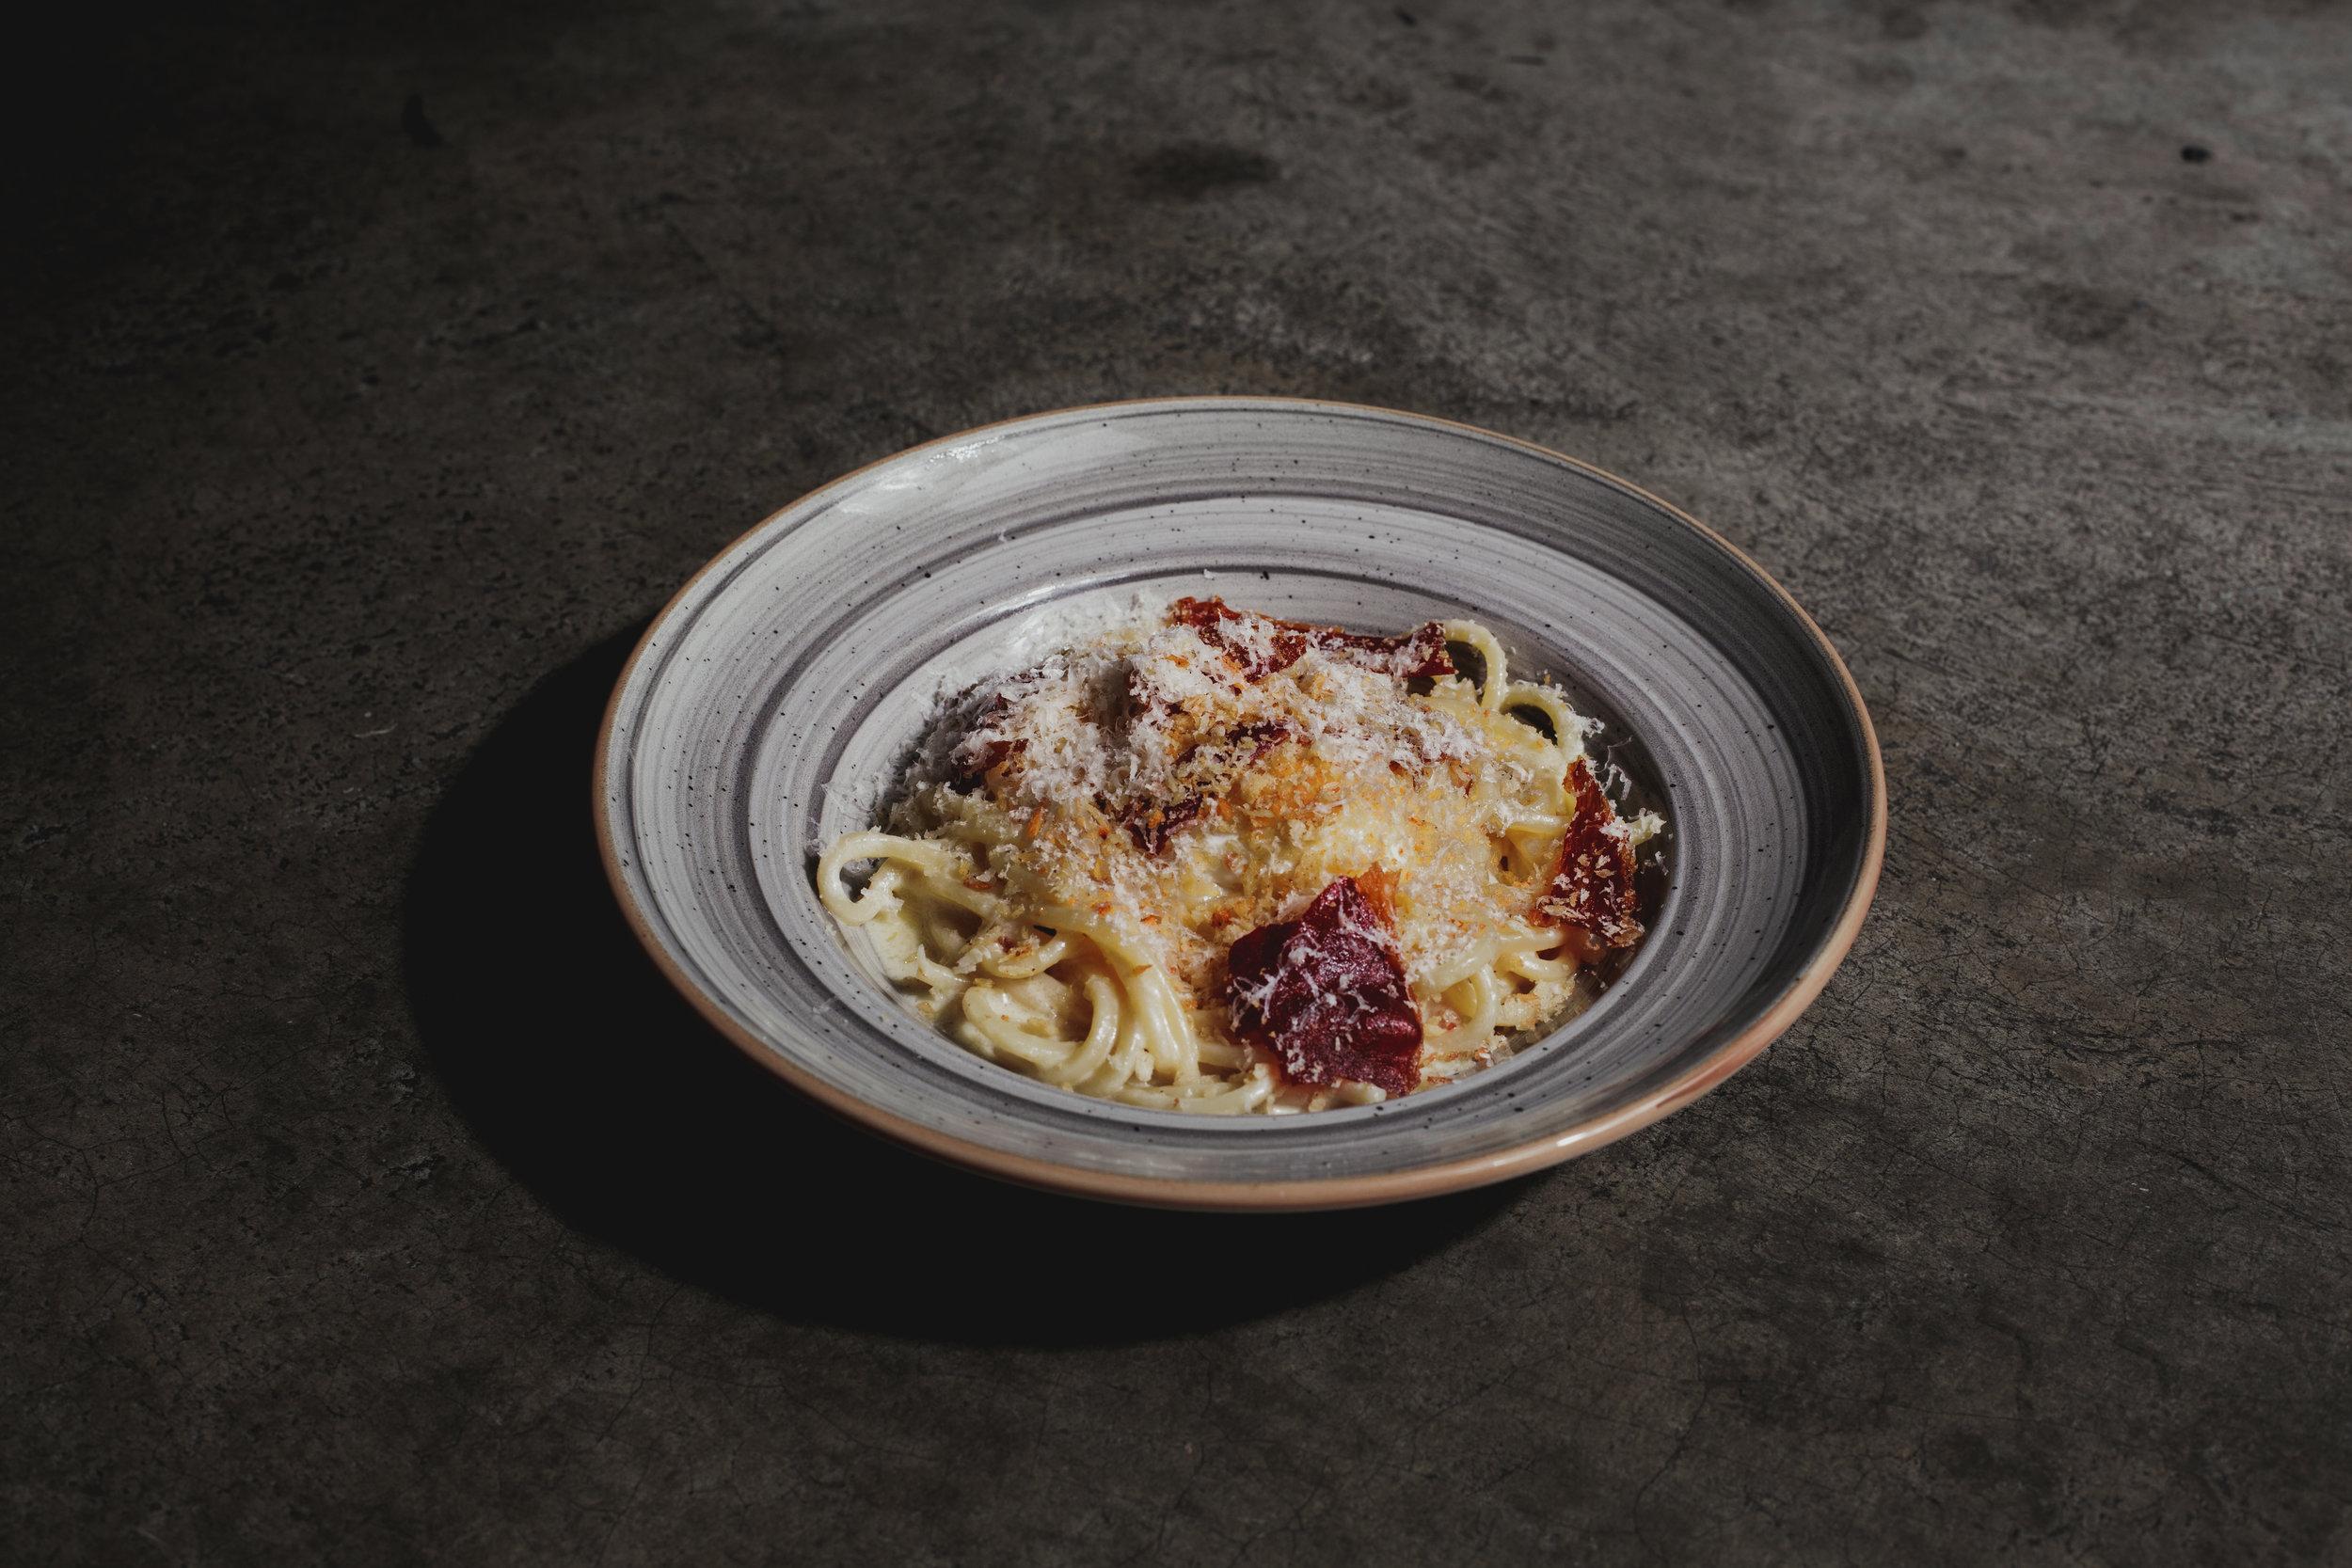 Chittara Ala Carbonara - Soft Boiled Egg, Truffle Cream, Ham Crumble, Parmesan